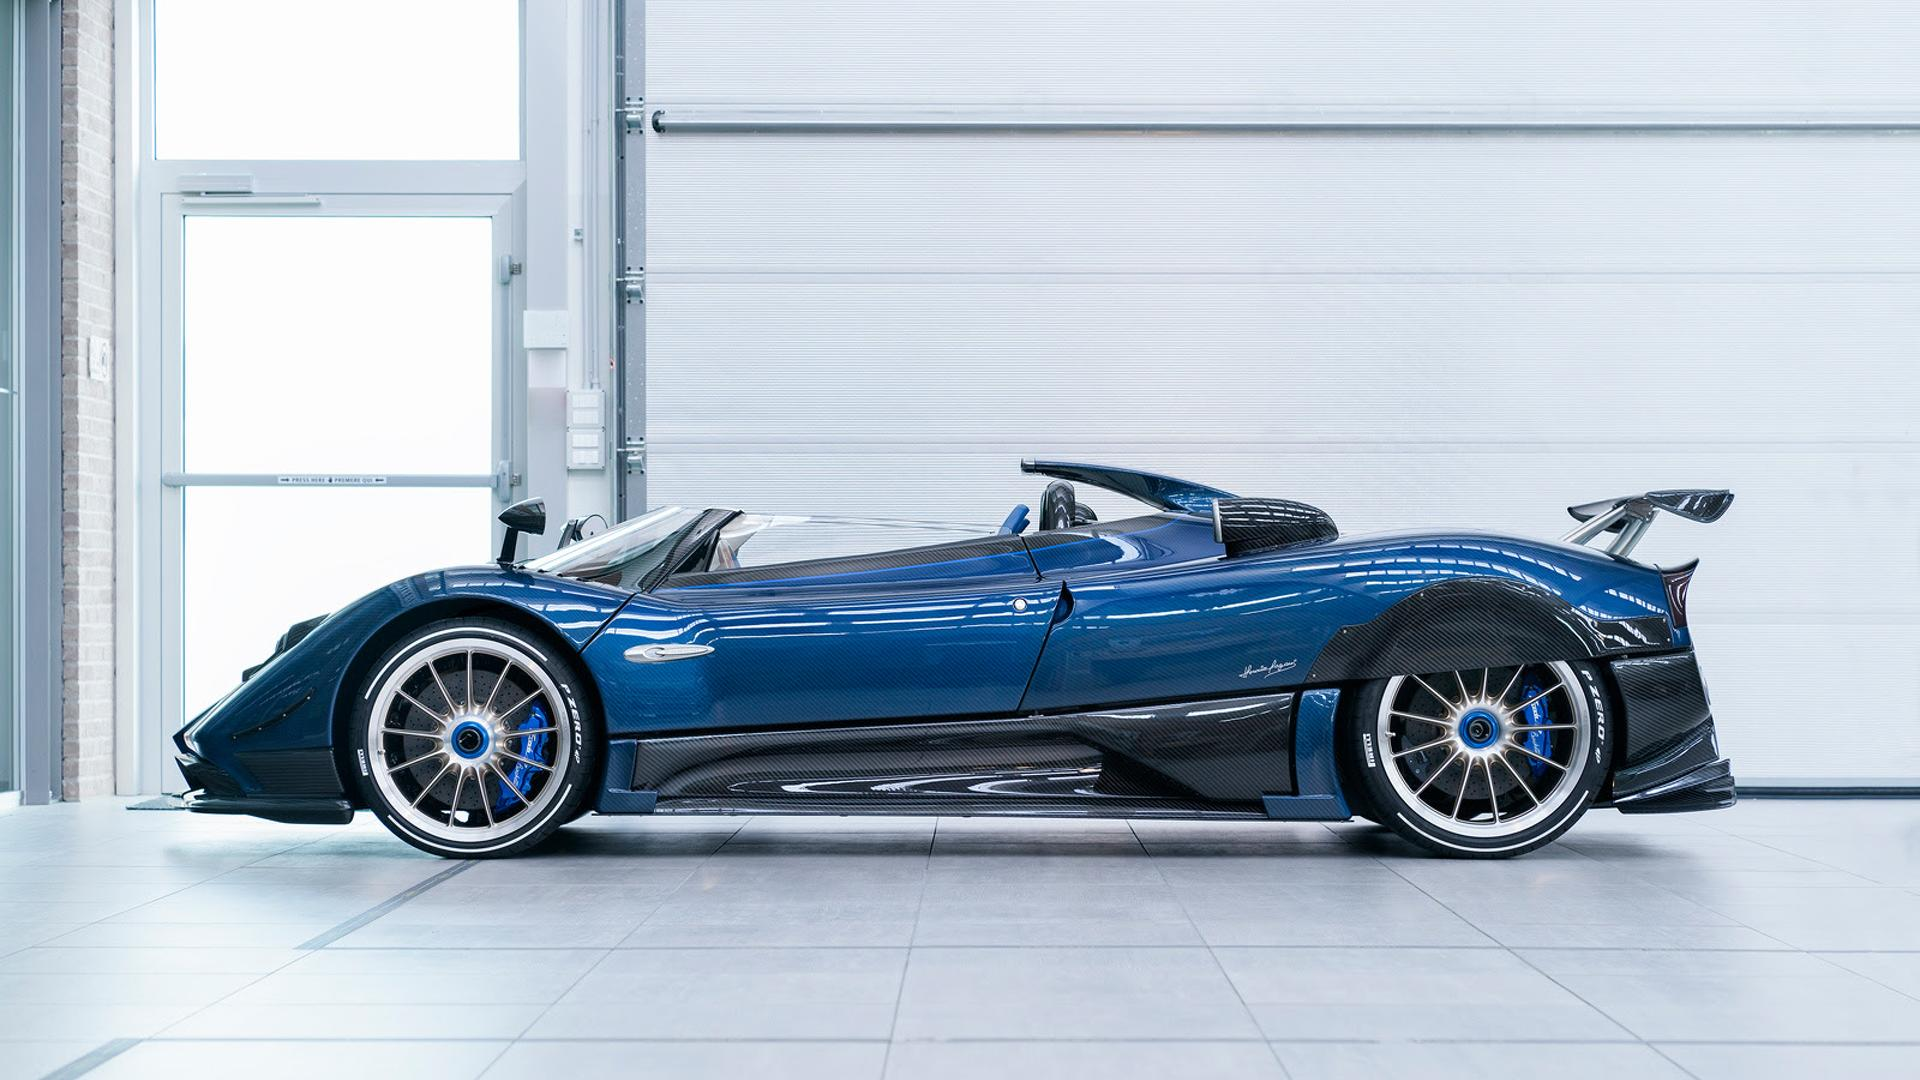 Pagani S Zonda Hp Barchetta Costs R230 Million Making It Most Expensive Car In The World